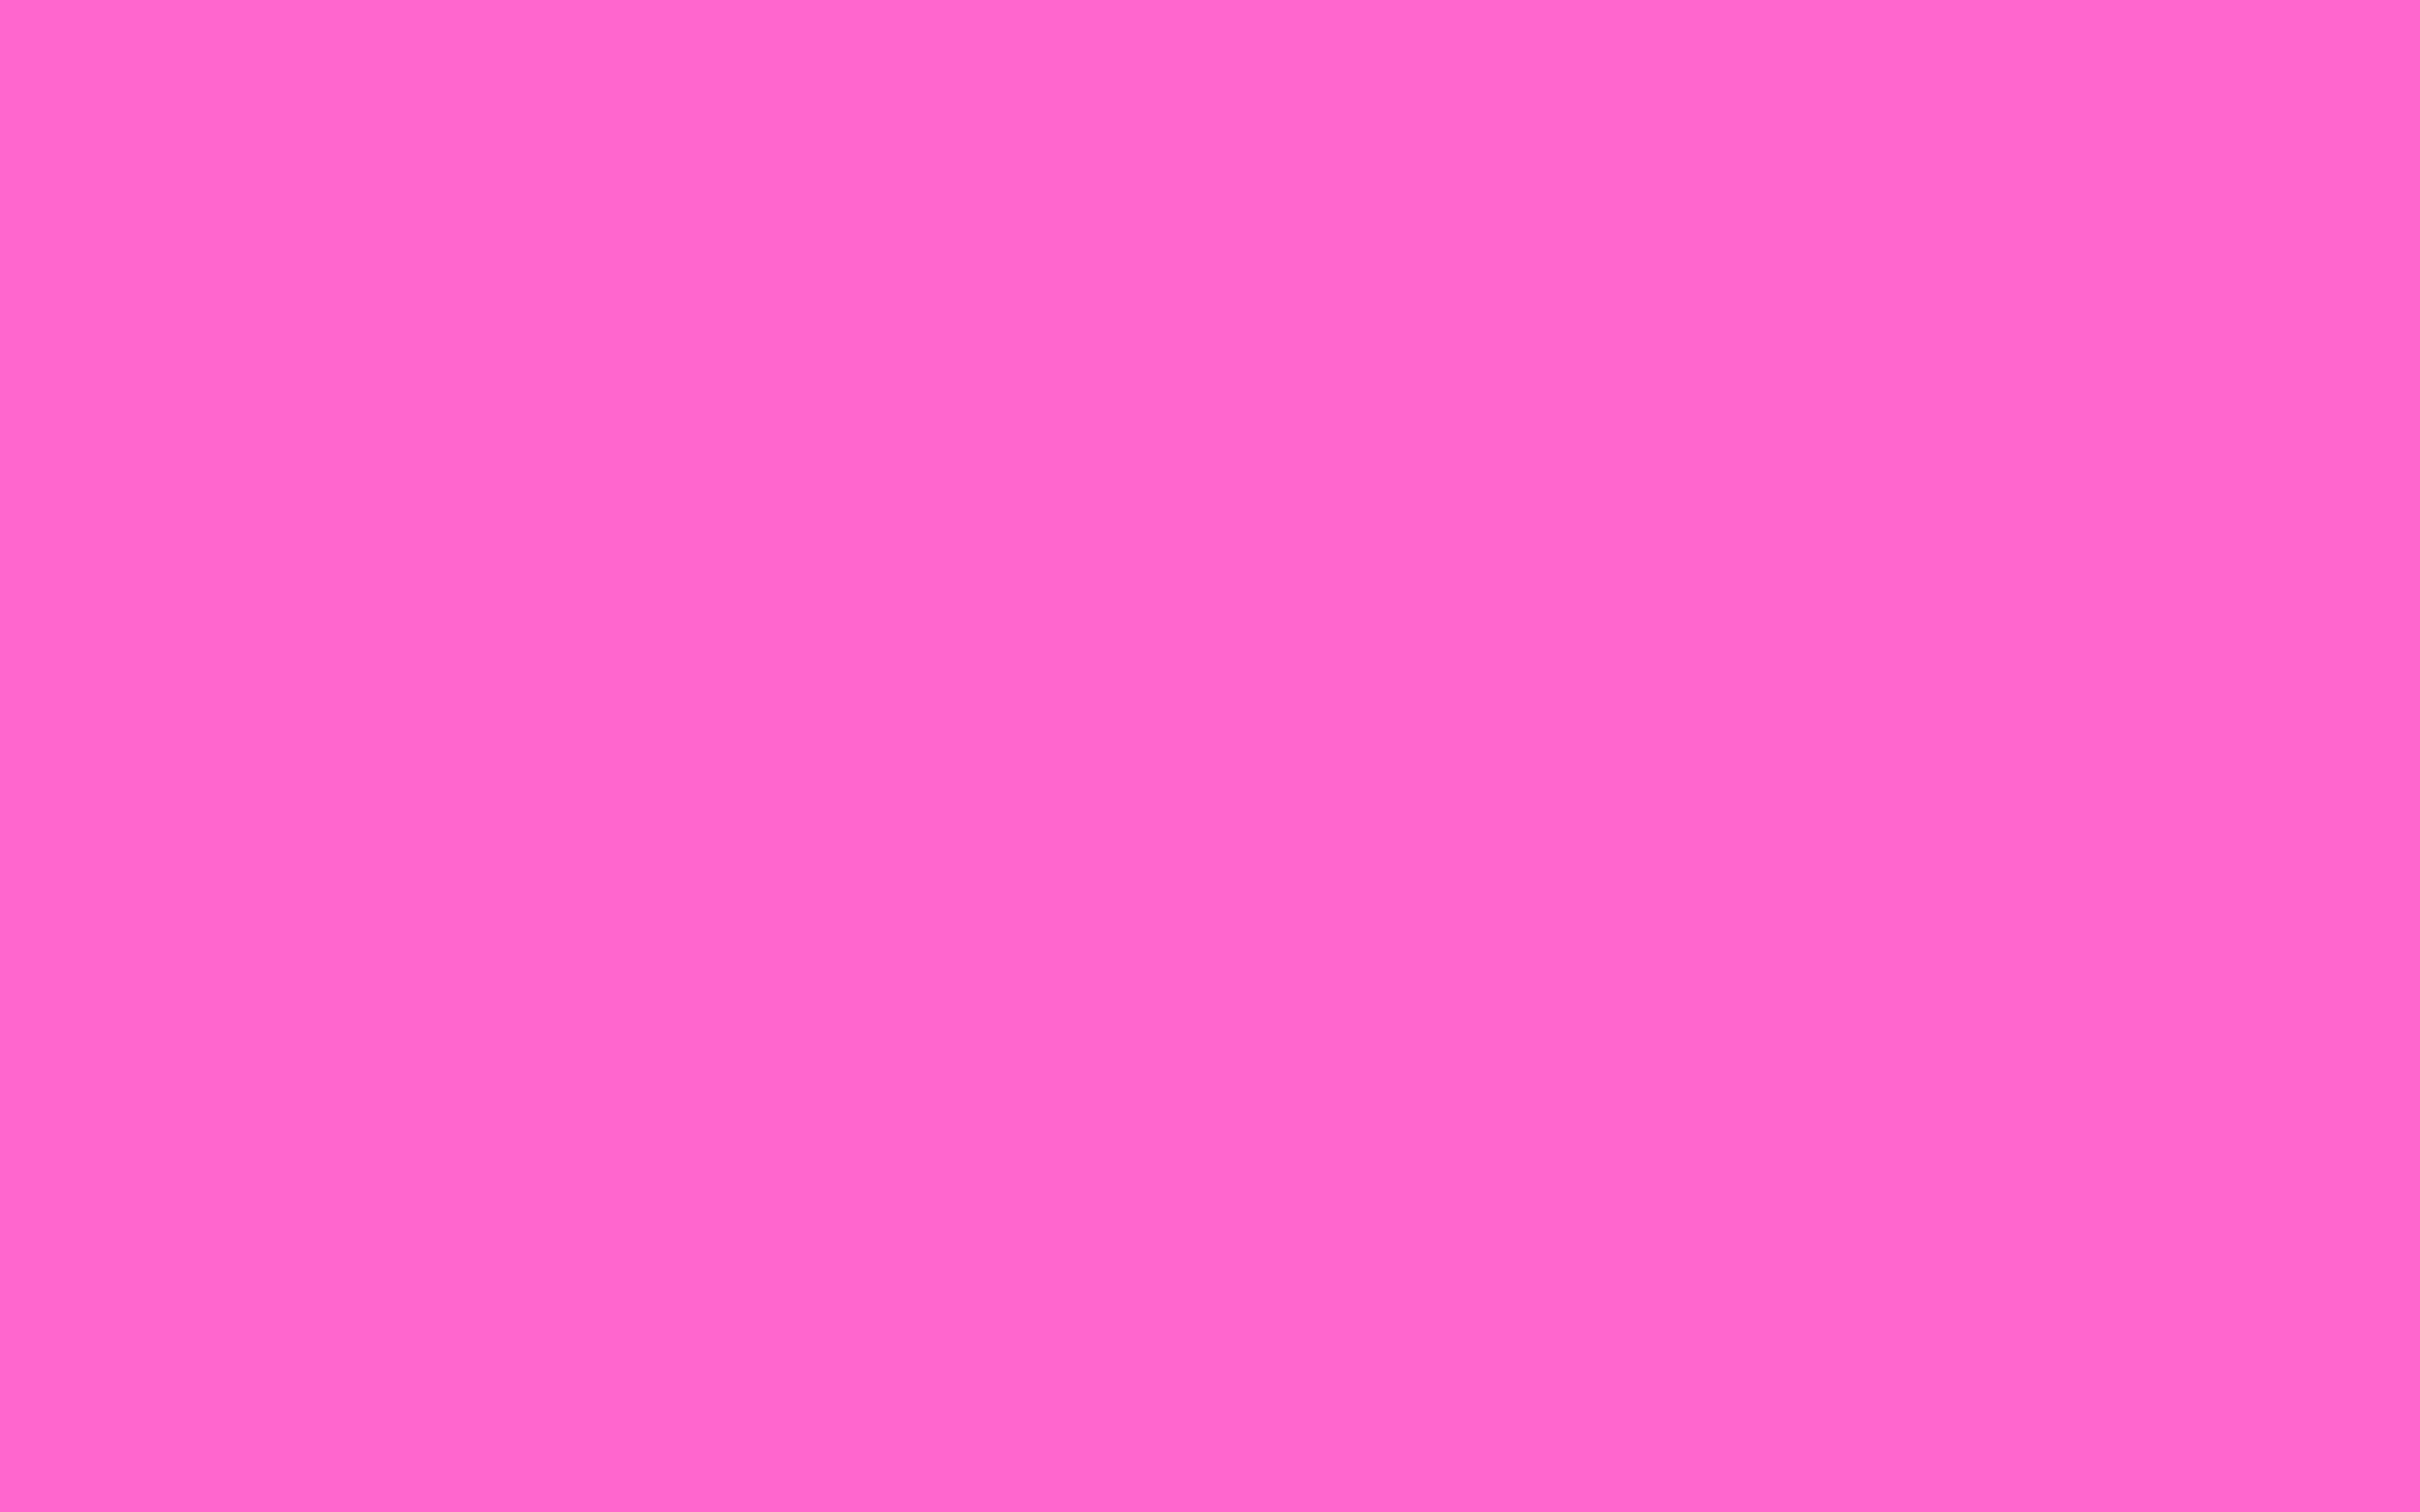 2560x1600 Rose Pink Solid Color Background